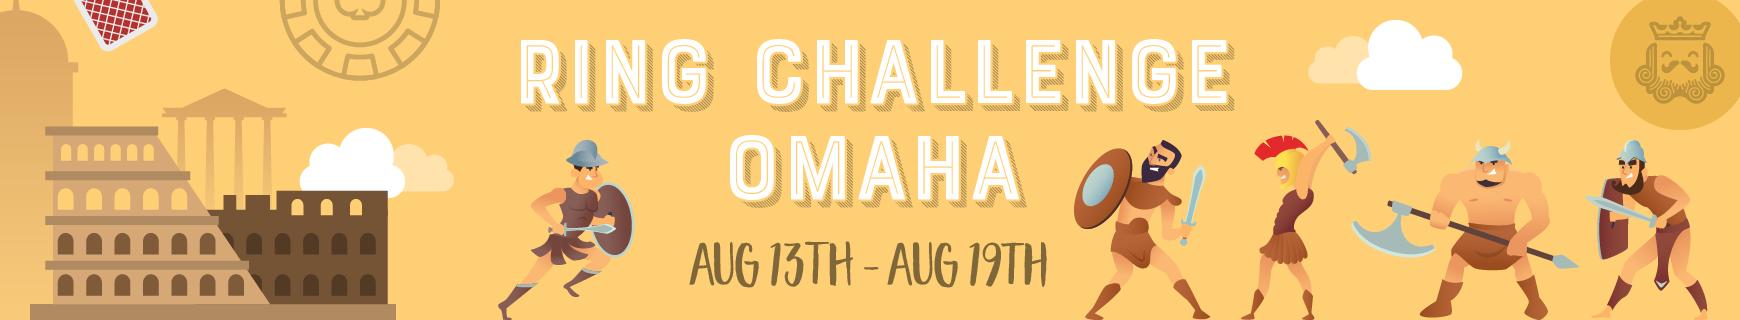 Ring challenge omaha %28870 x 160%29 2x